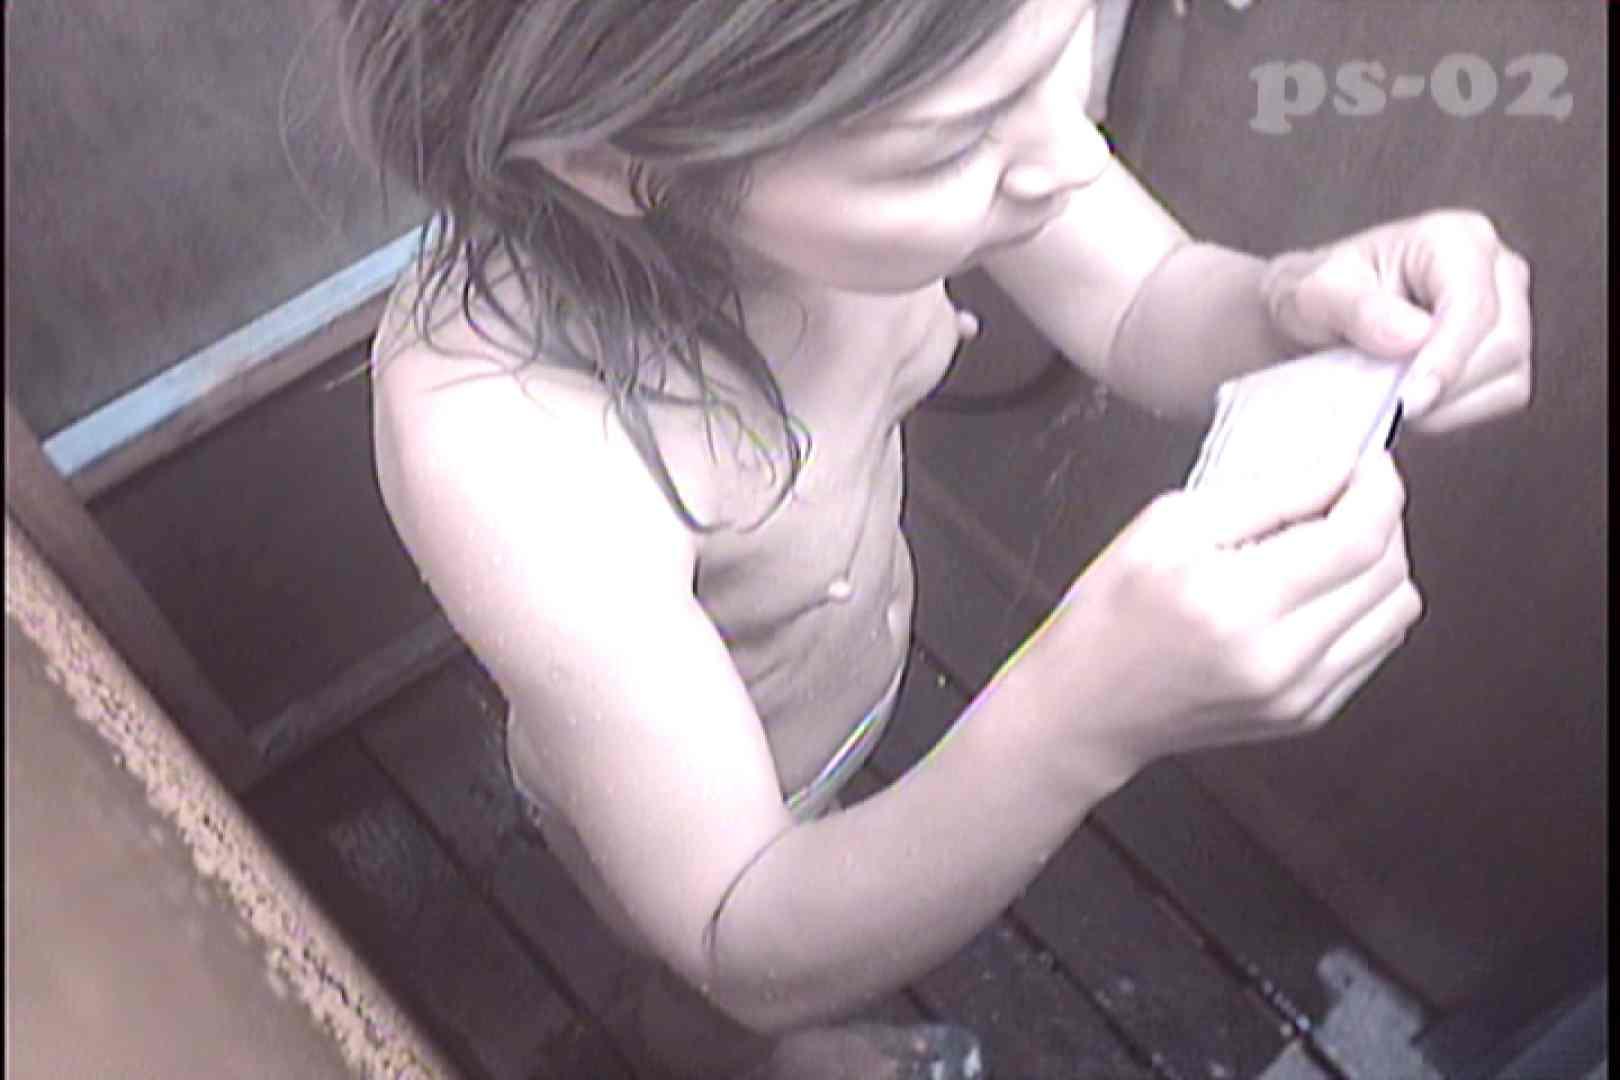 File.09 貧乳そして大きな乳首のお姉さん おまんこ無修正 ぱこり動画紹介 106画像 39